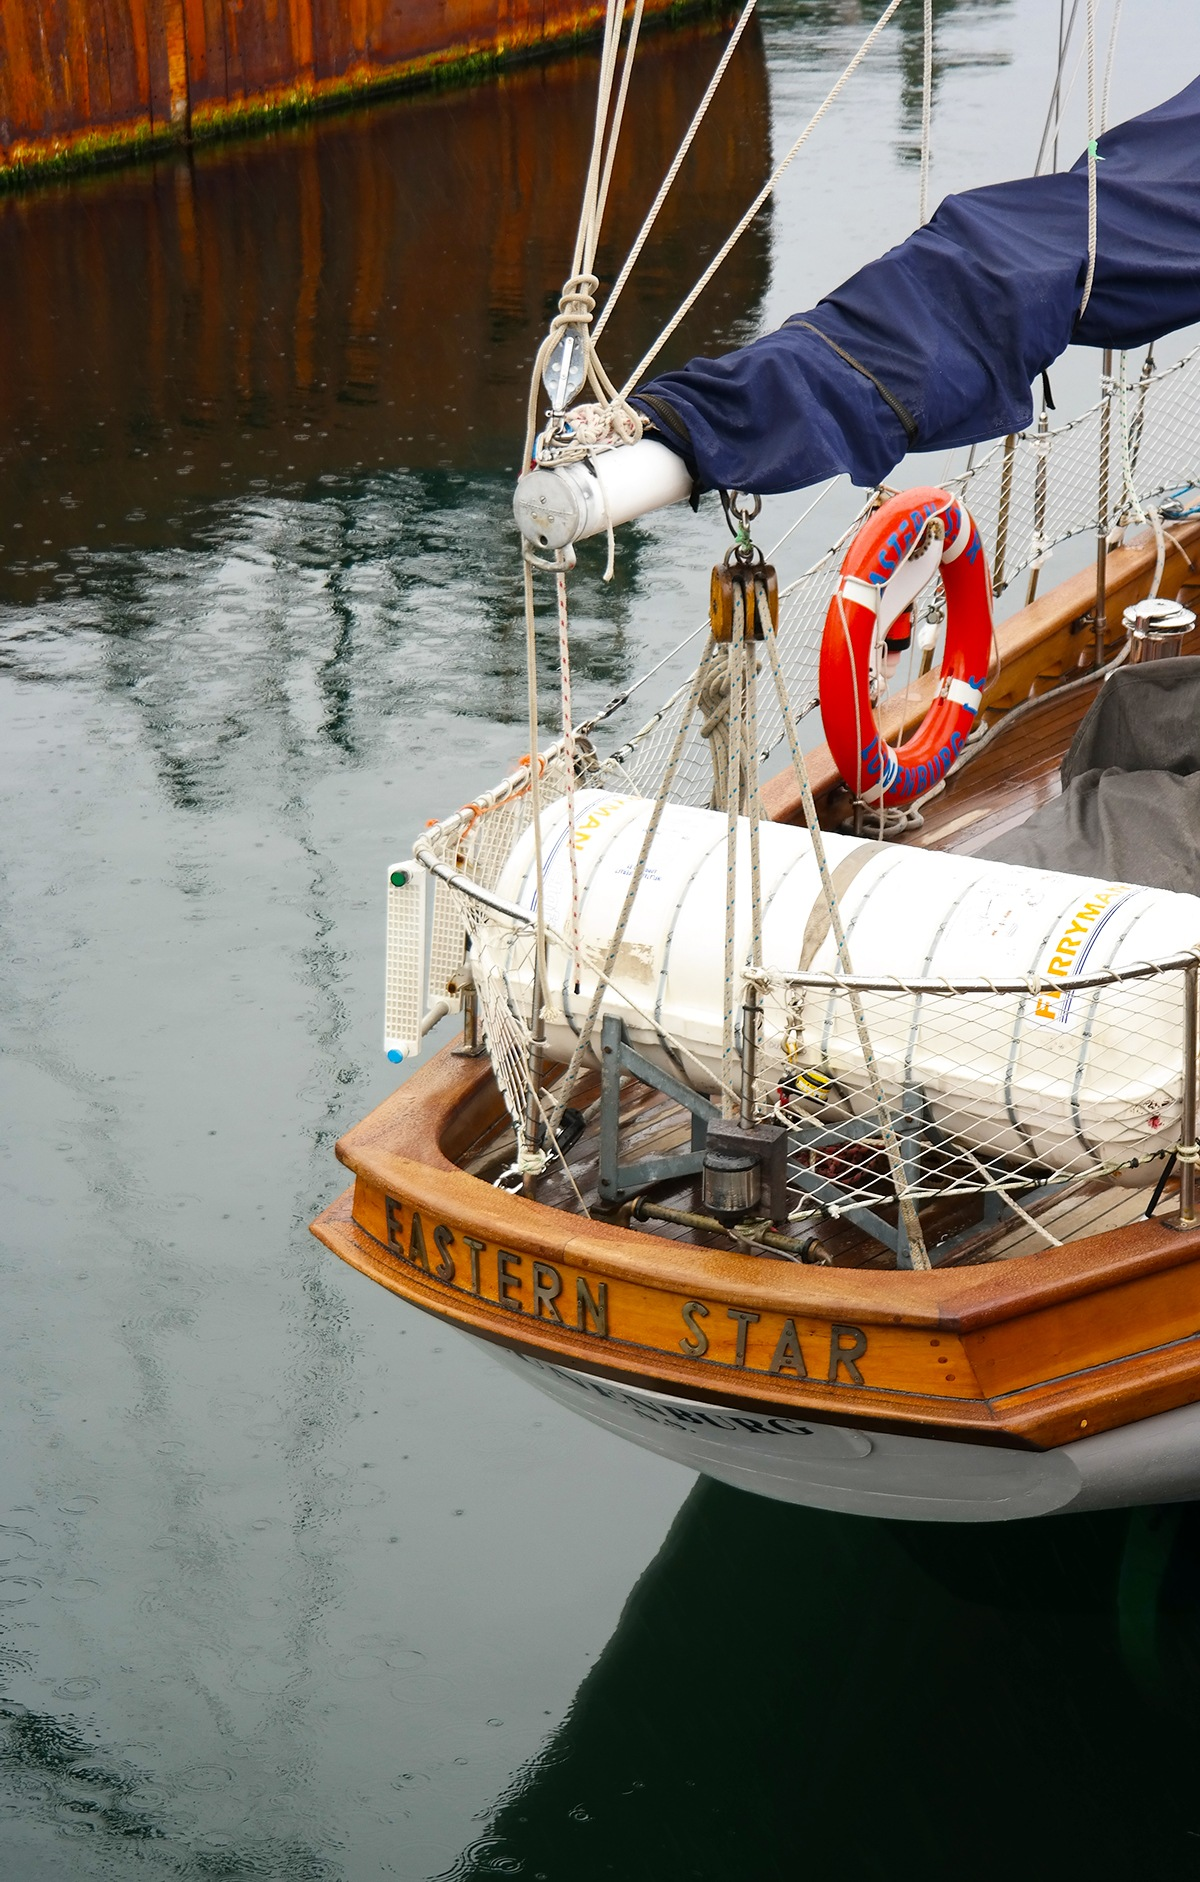 Northern Star - boat in Lunenburg, Nova Scotia, Canada